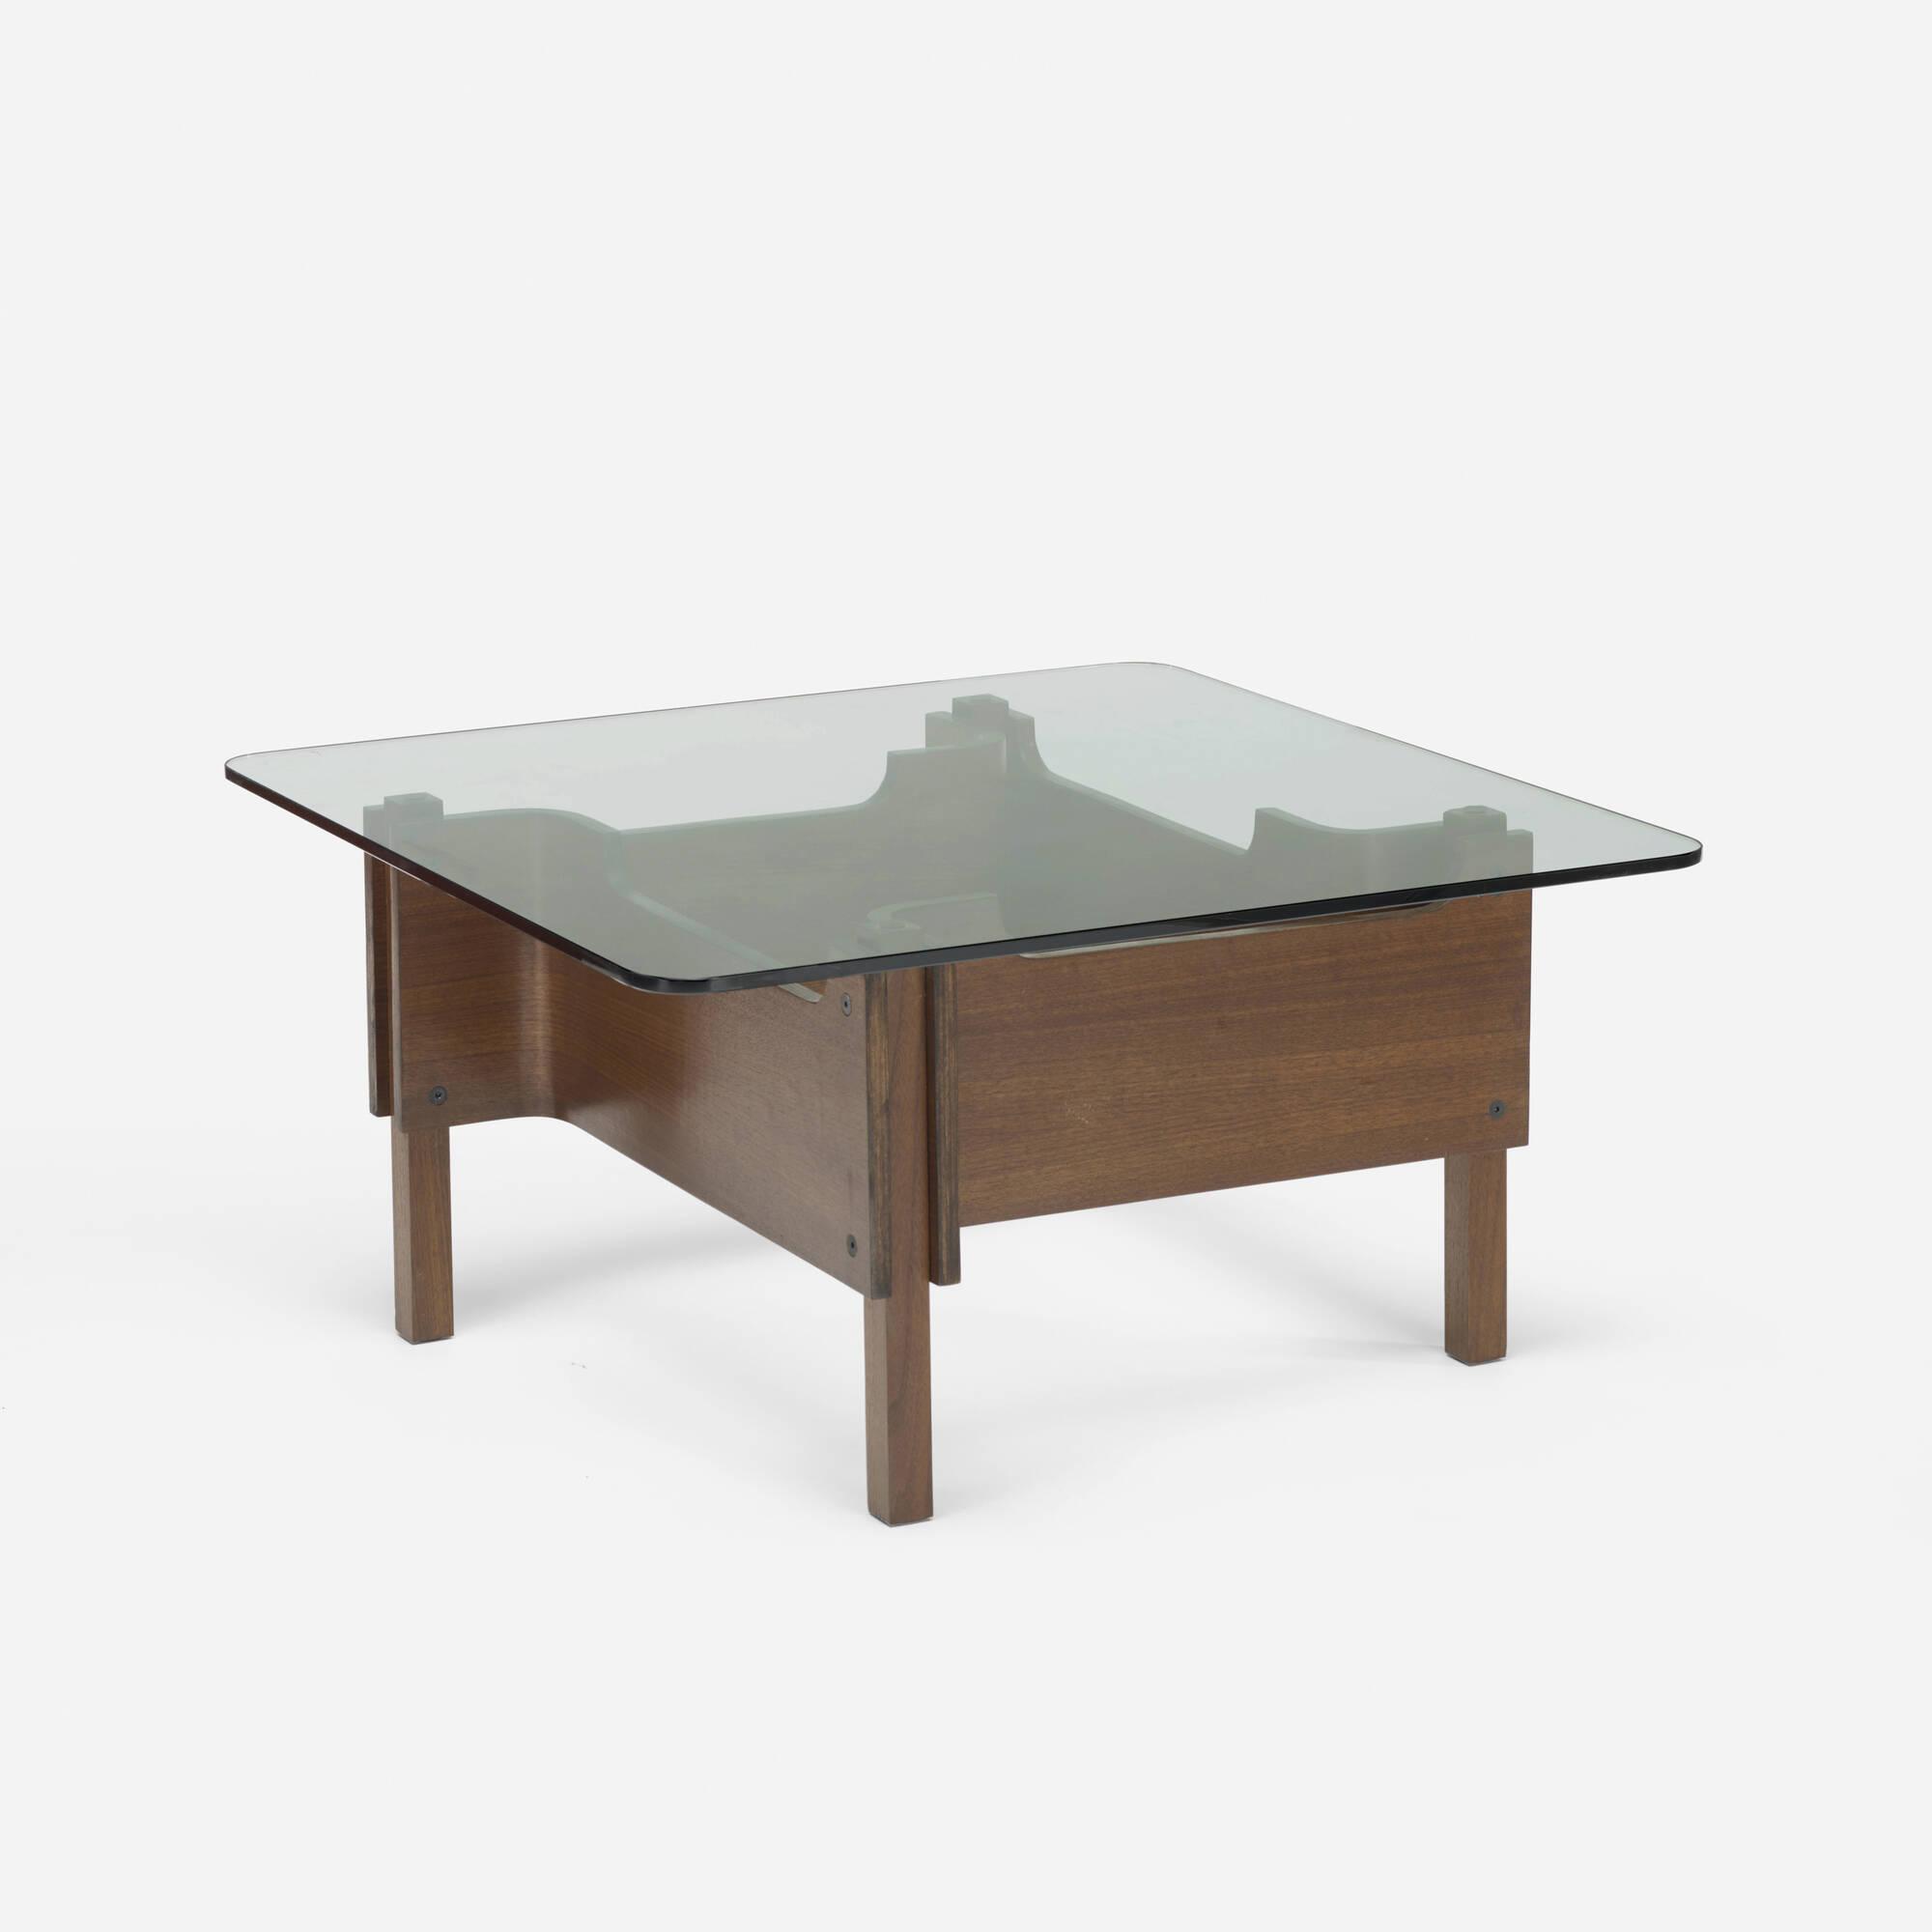 429: Paolo Portoghesi / Levogiro coffee table (1 of 2)